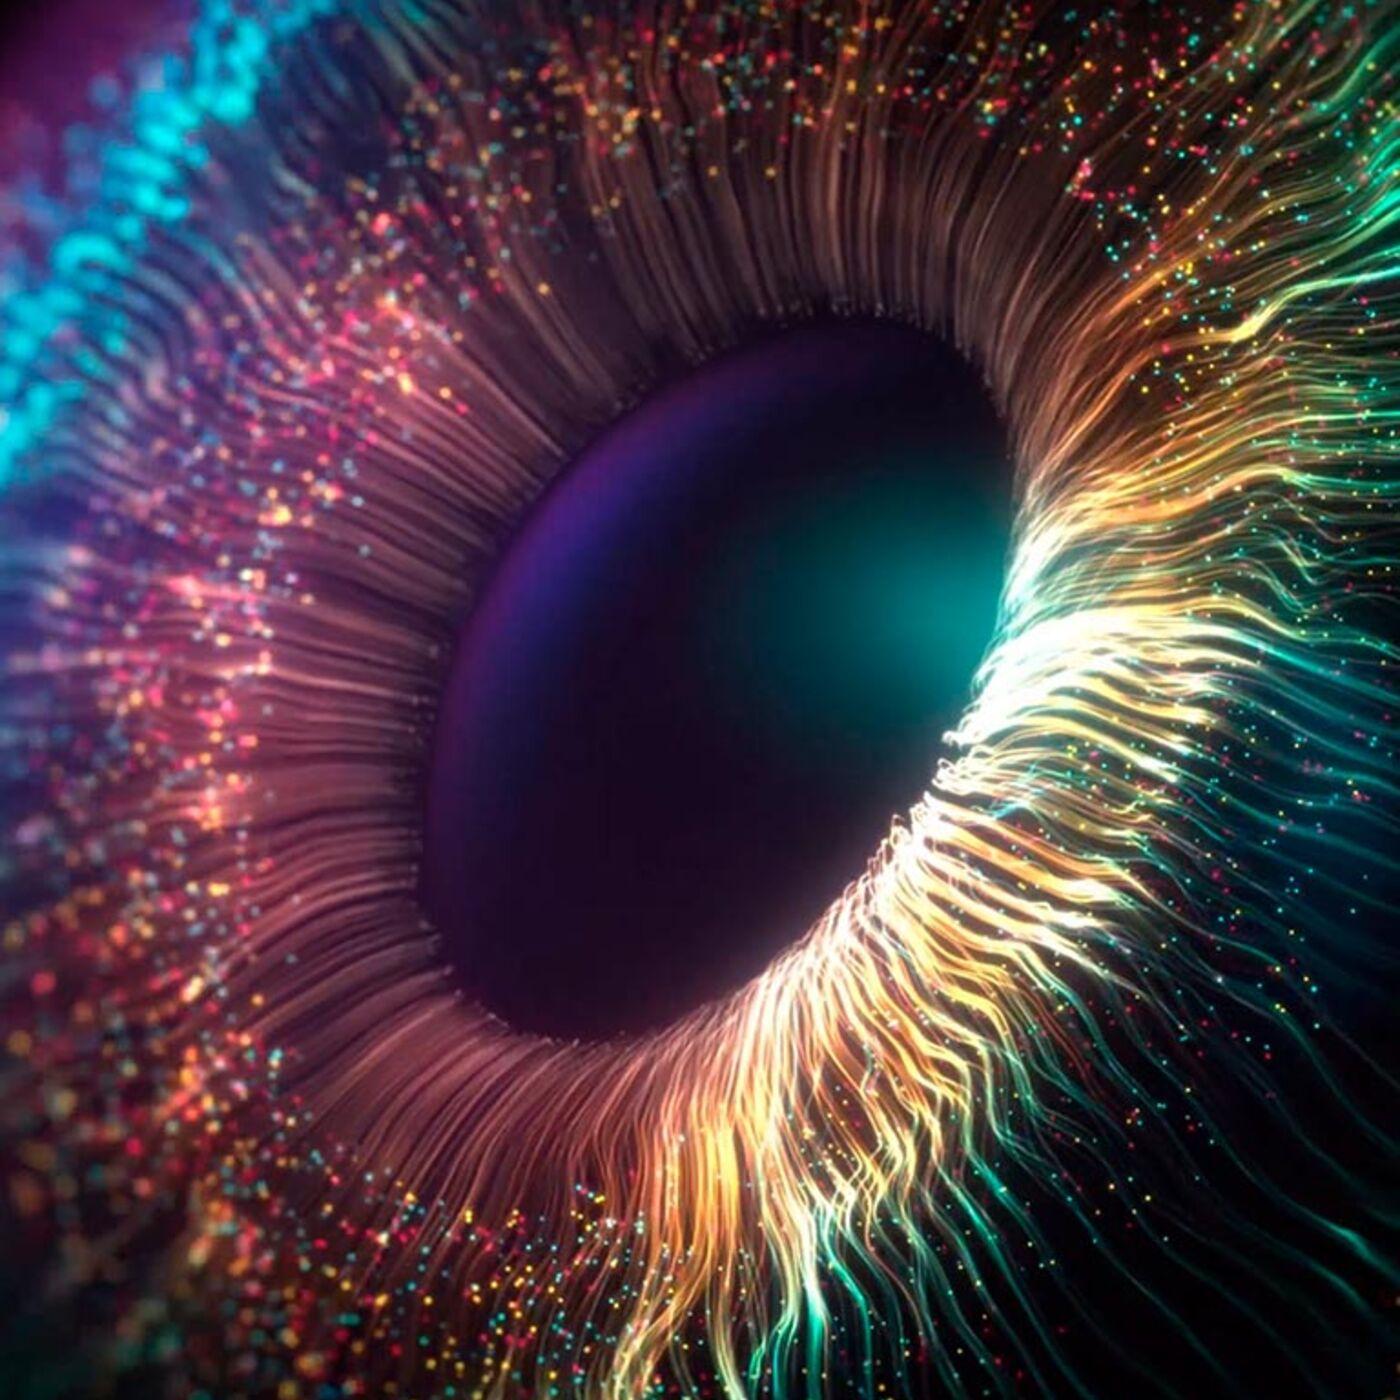 #Bonus [ BODY IS A TEMPLE ] Interstellar Transcendental Meditation with Kari